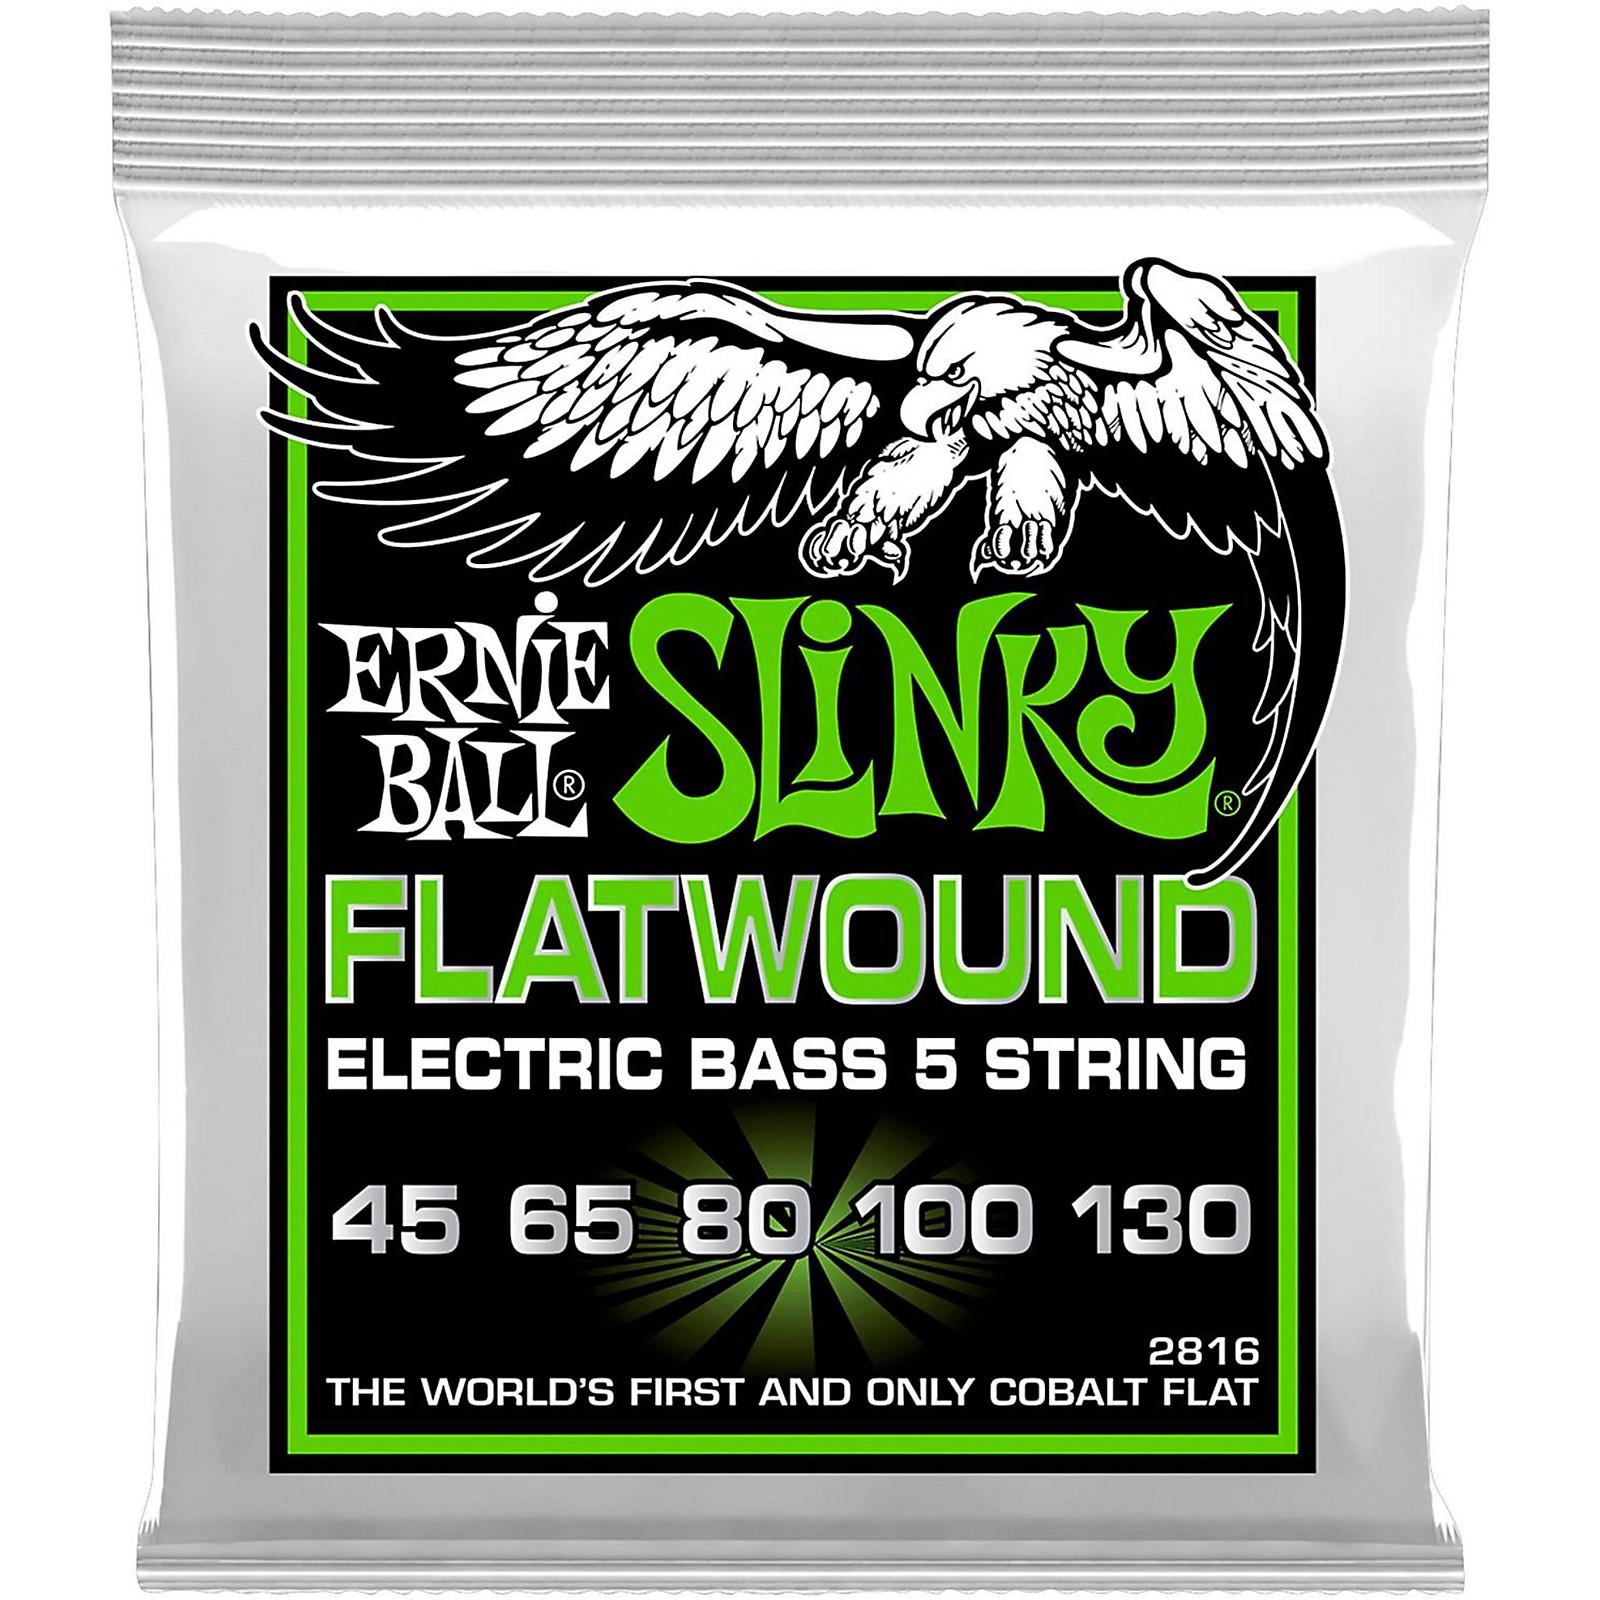 Ernie Ball 2816 Slinky Flatwound 5-String Bass Strings